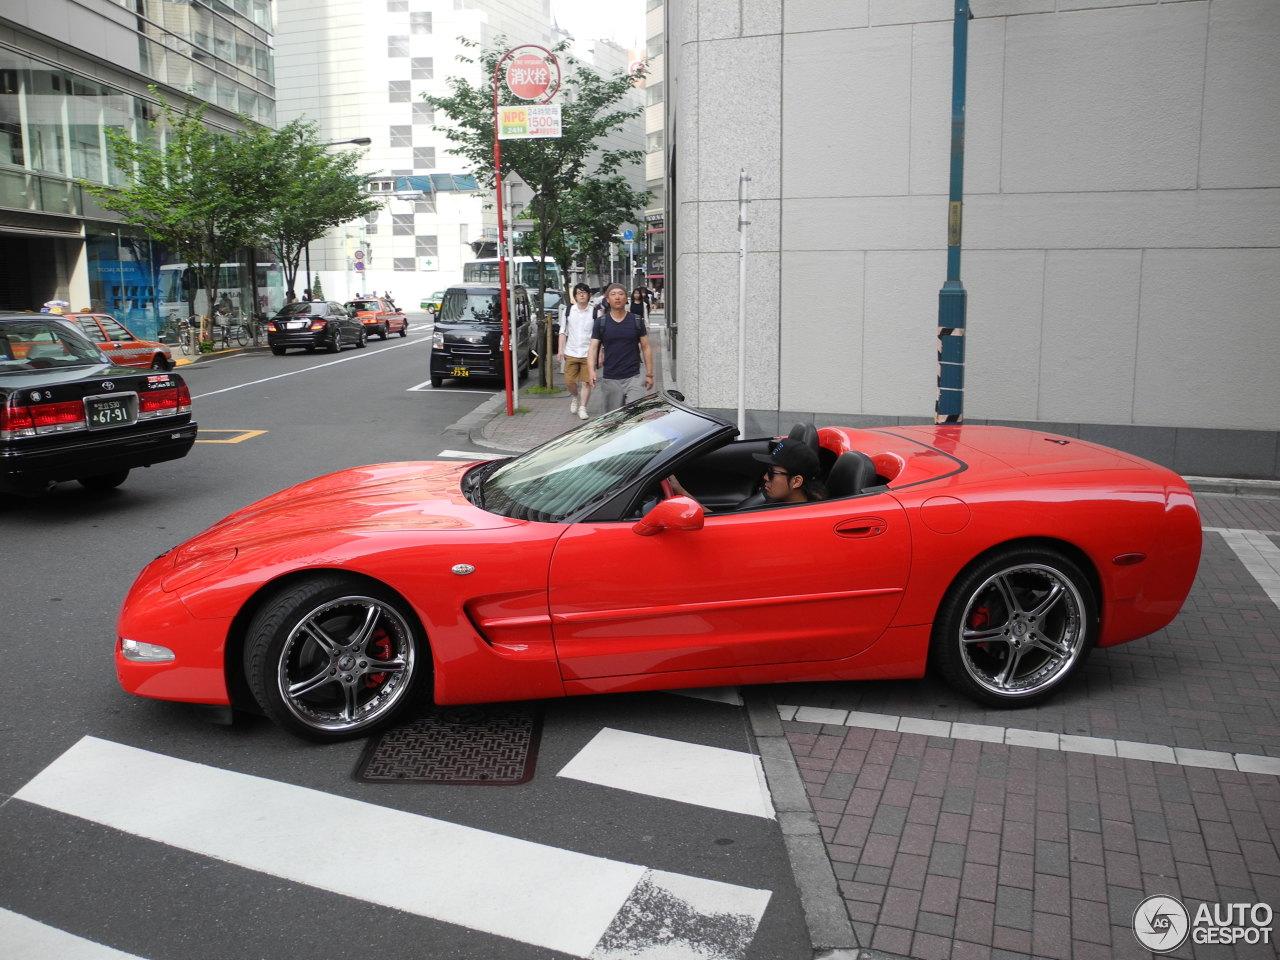 chevrolet corvette c5 convertible 3 june 2015 autogespot. Black Bedroom Furniture Sets. Home Design Ideas